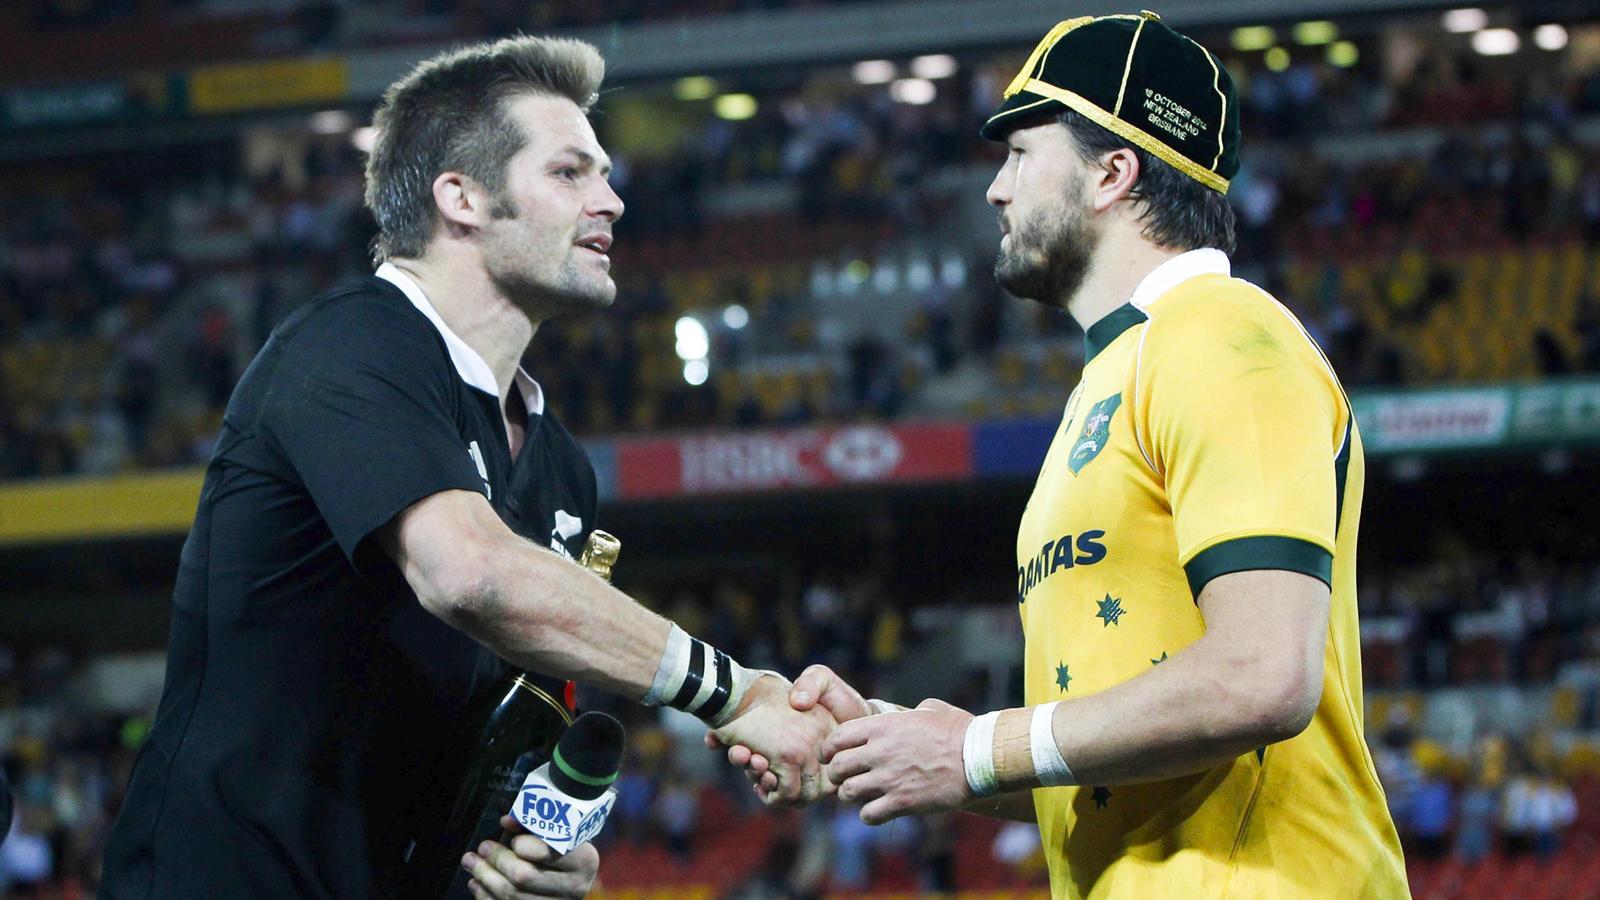 Coupe du monde australie nouvelle z lande les meilleurs ennemis coupe du monde 2015 - Coupe du monde nouvelle zelande ...